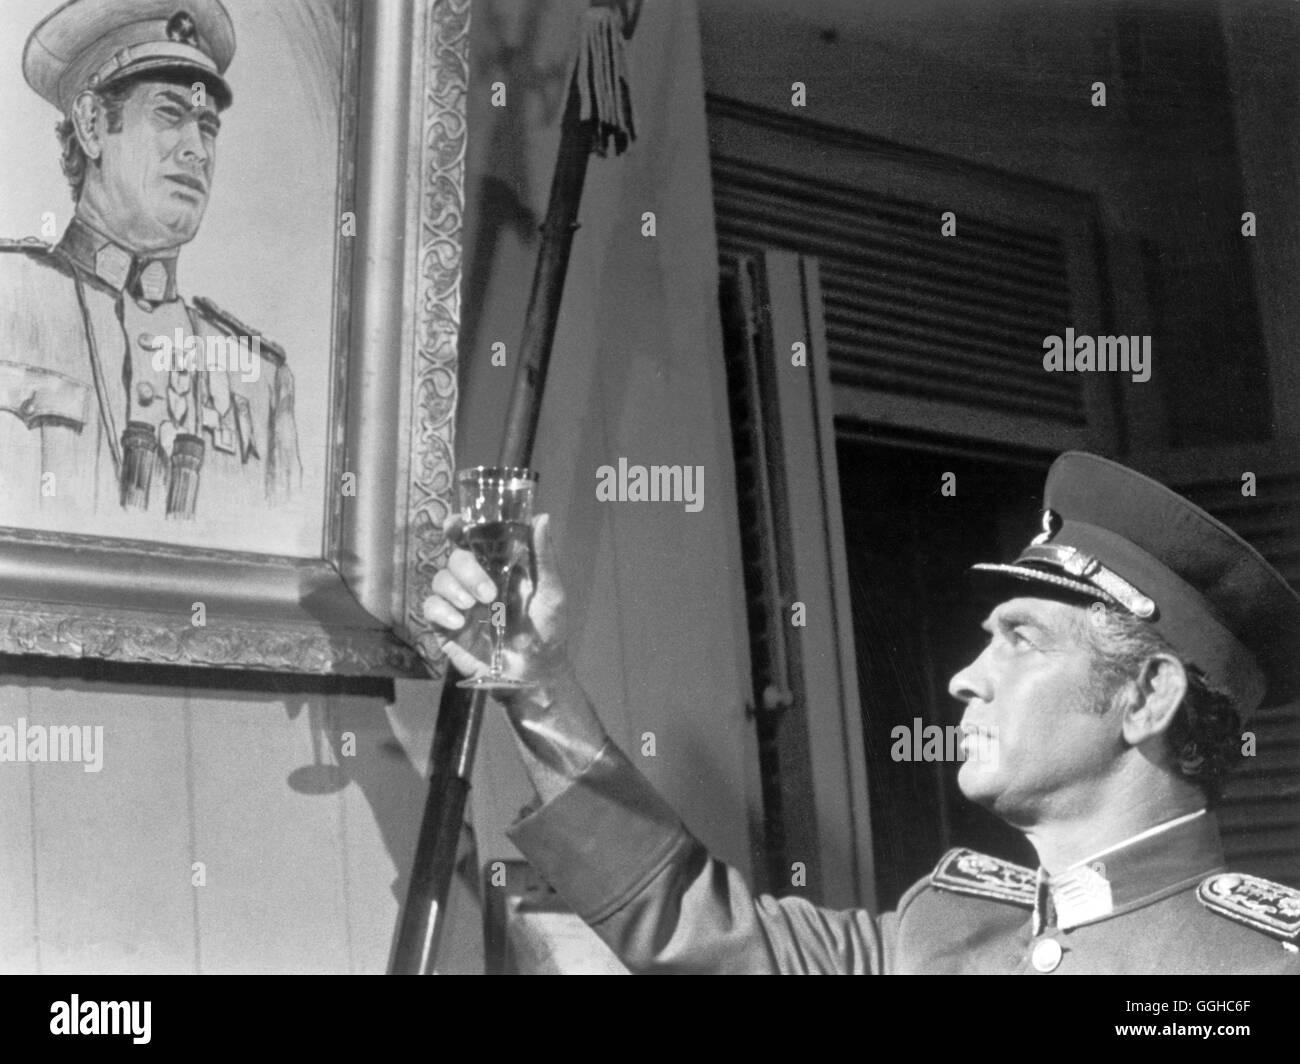 LA ISLA DE LOS HOMBRES SOLOS / Mexiko / Rene Cardona Filmszene: Offizier prostet Gemälde zu Regie: Rene Cardona - Stock Image